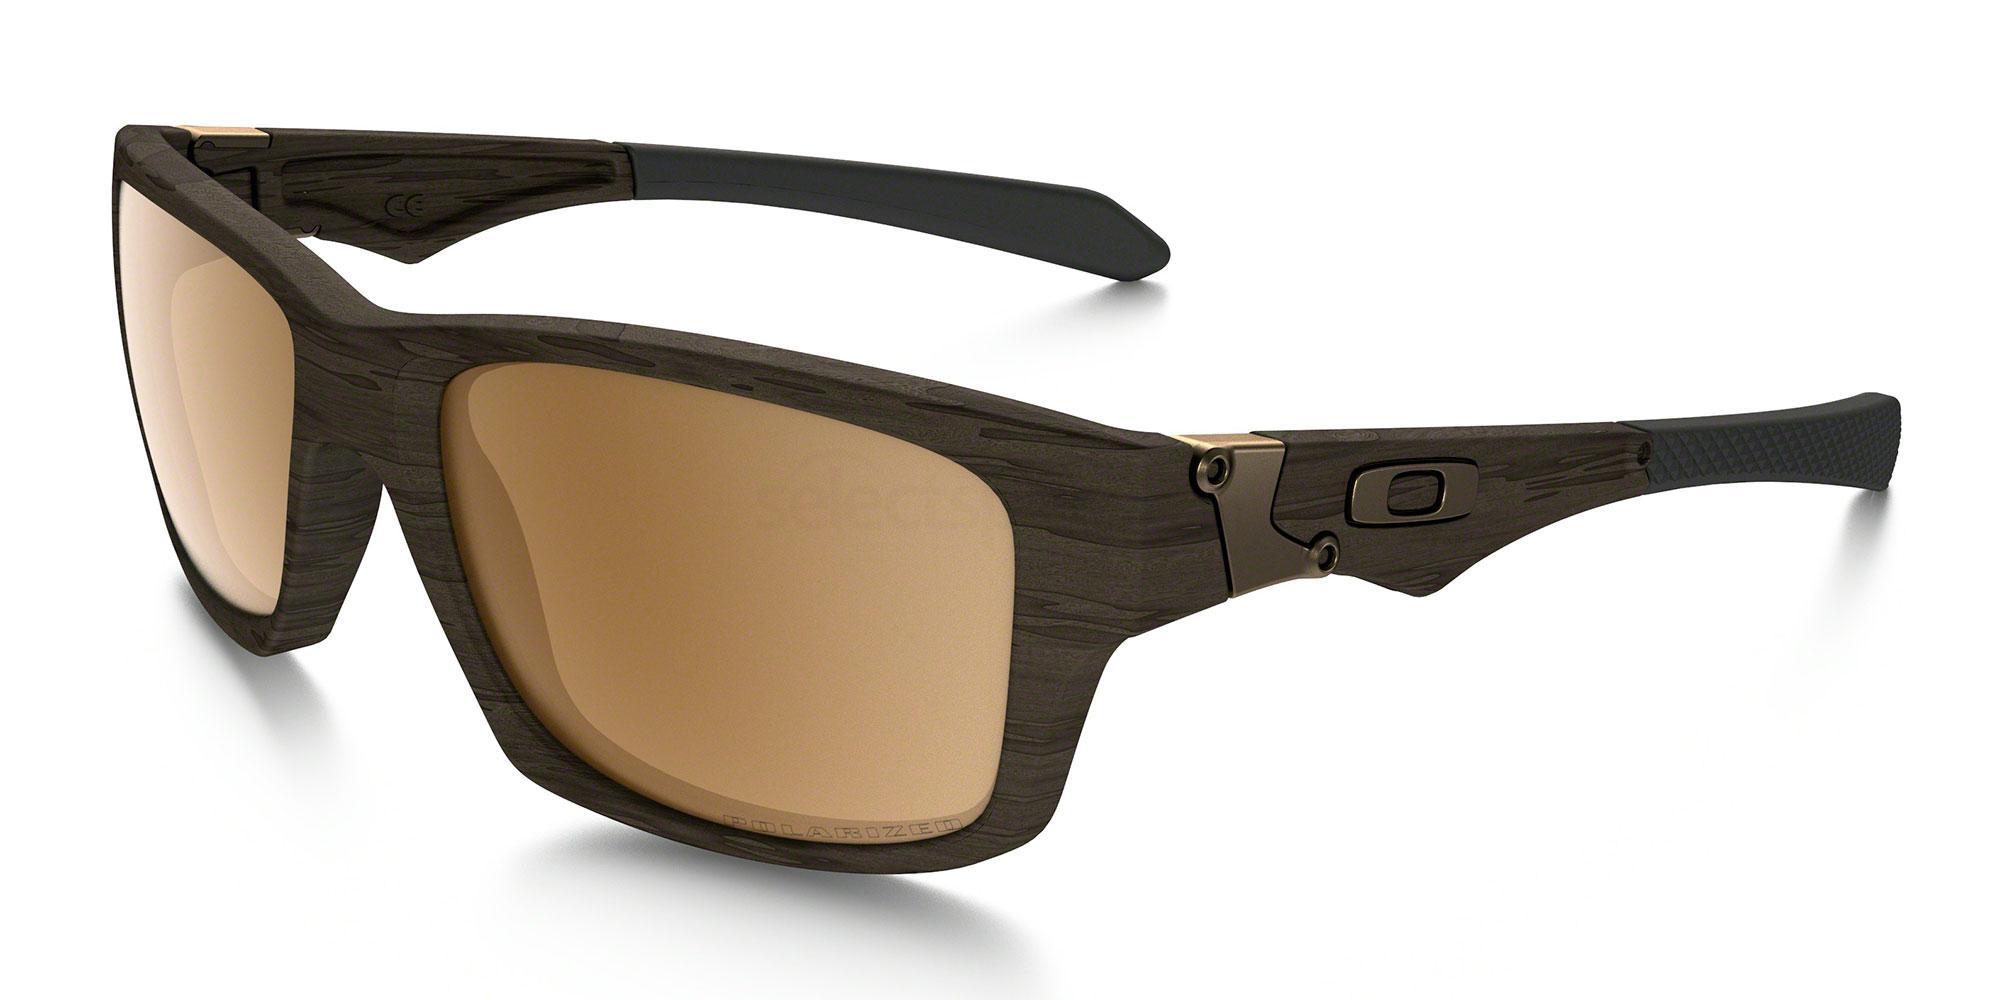 913507 OO9135 JUPITER SQUARED (Polarized) Sunglasses, Oakley